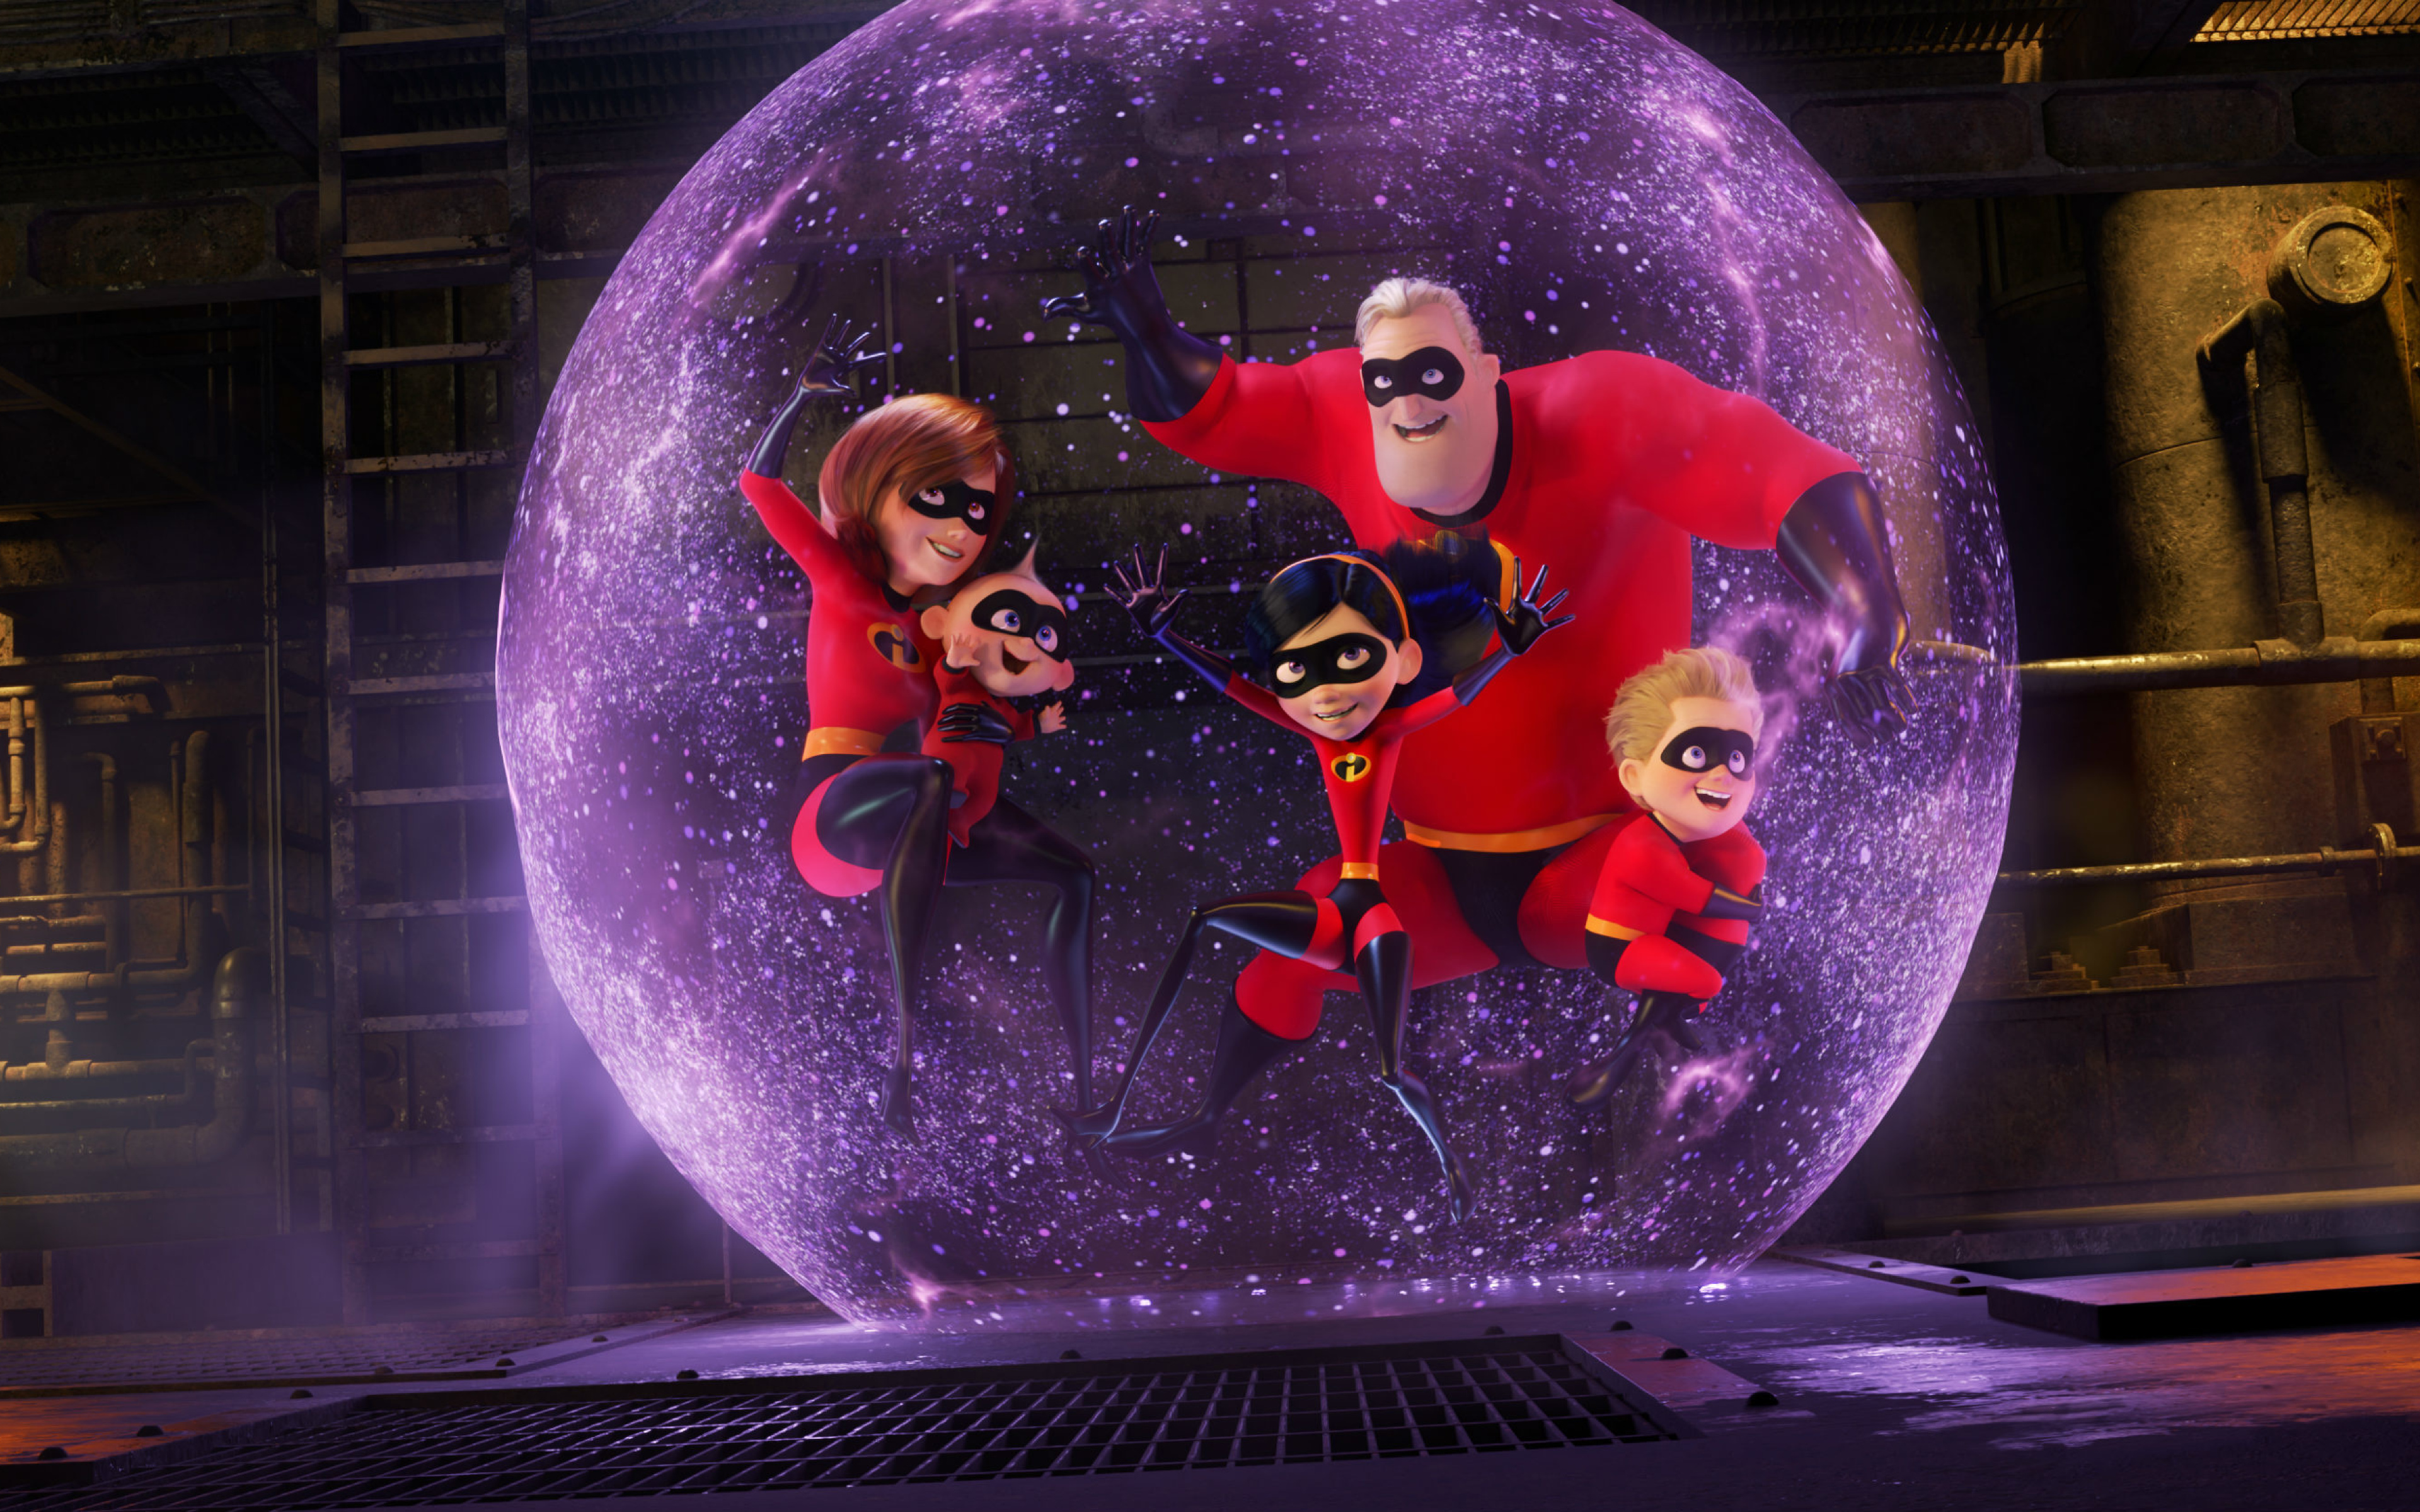 Incredible Ii Wallpaper Free: The Incredibles 2 Movie 2018, HD 4K Wallpaper